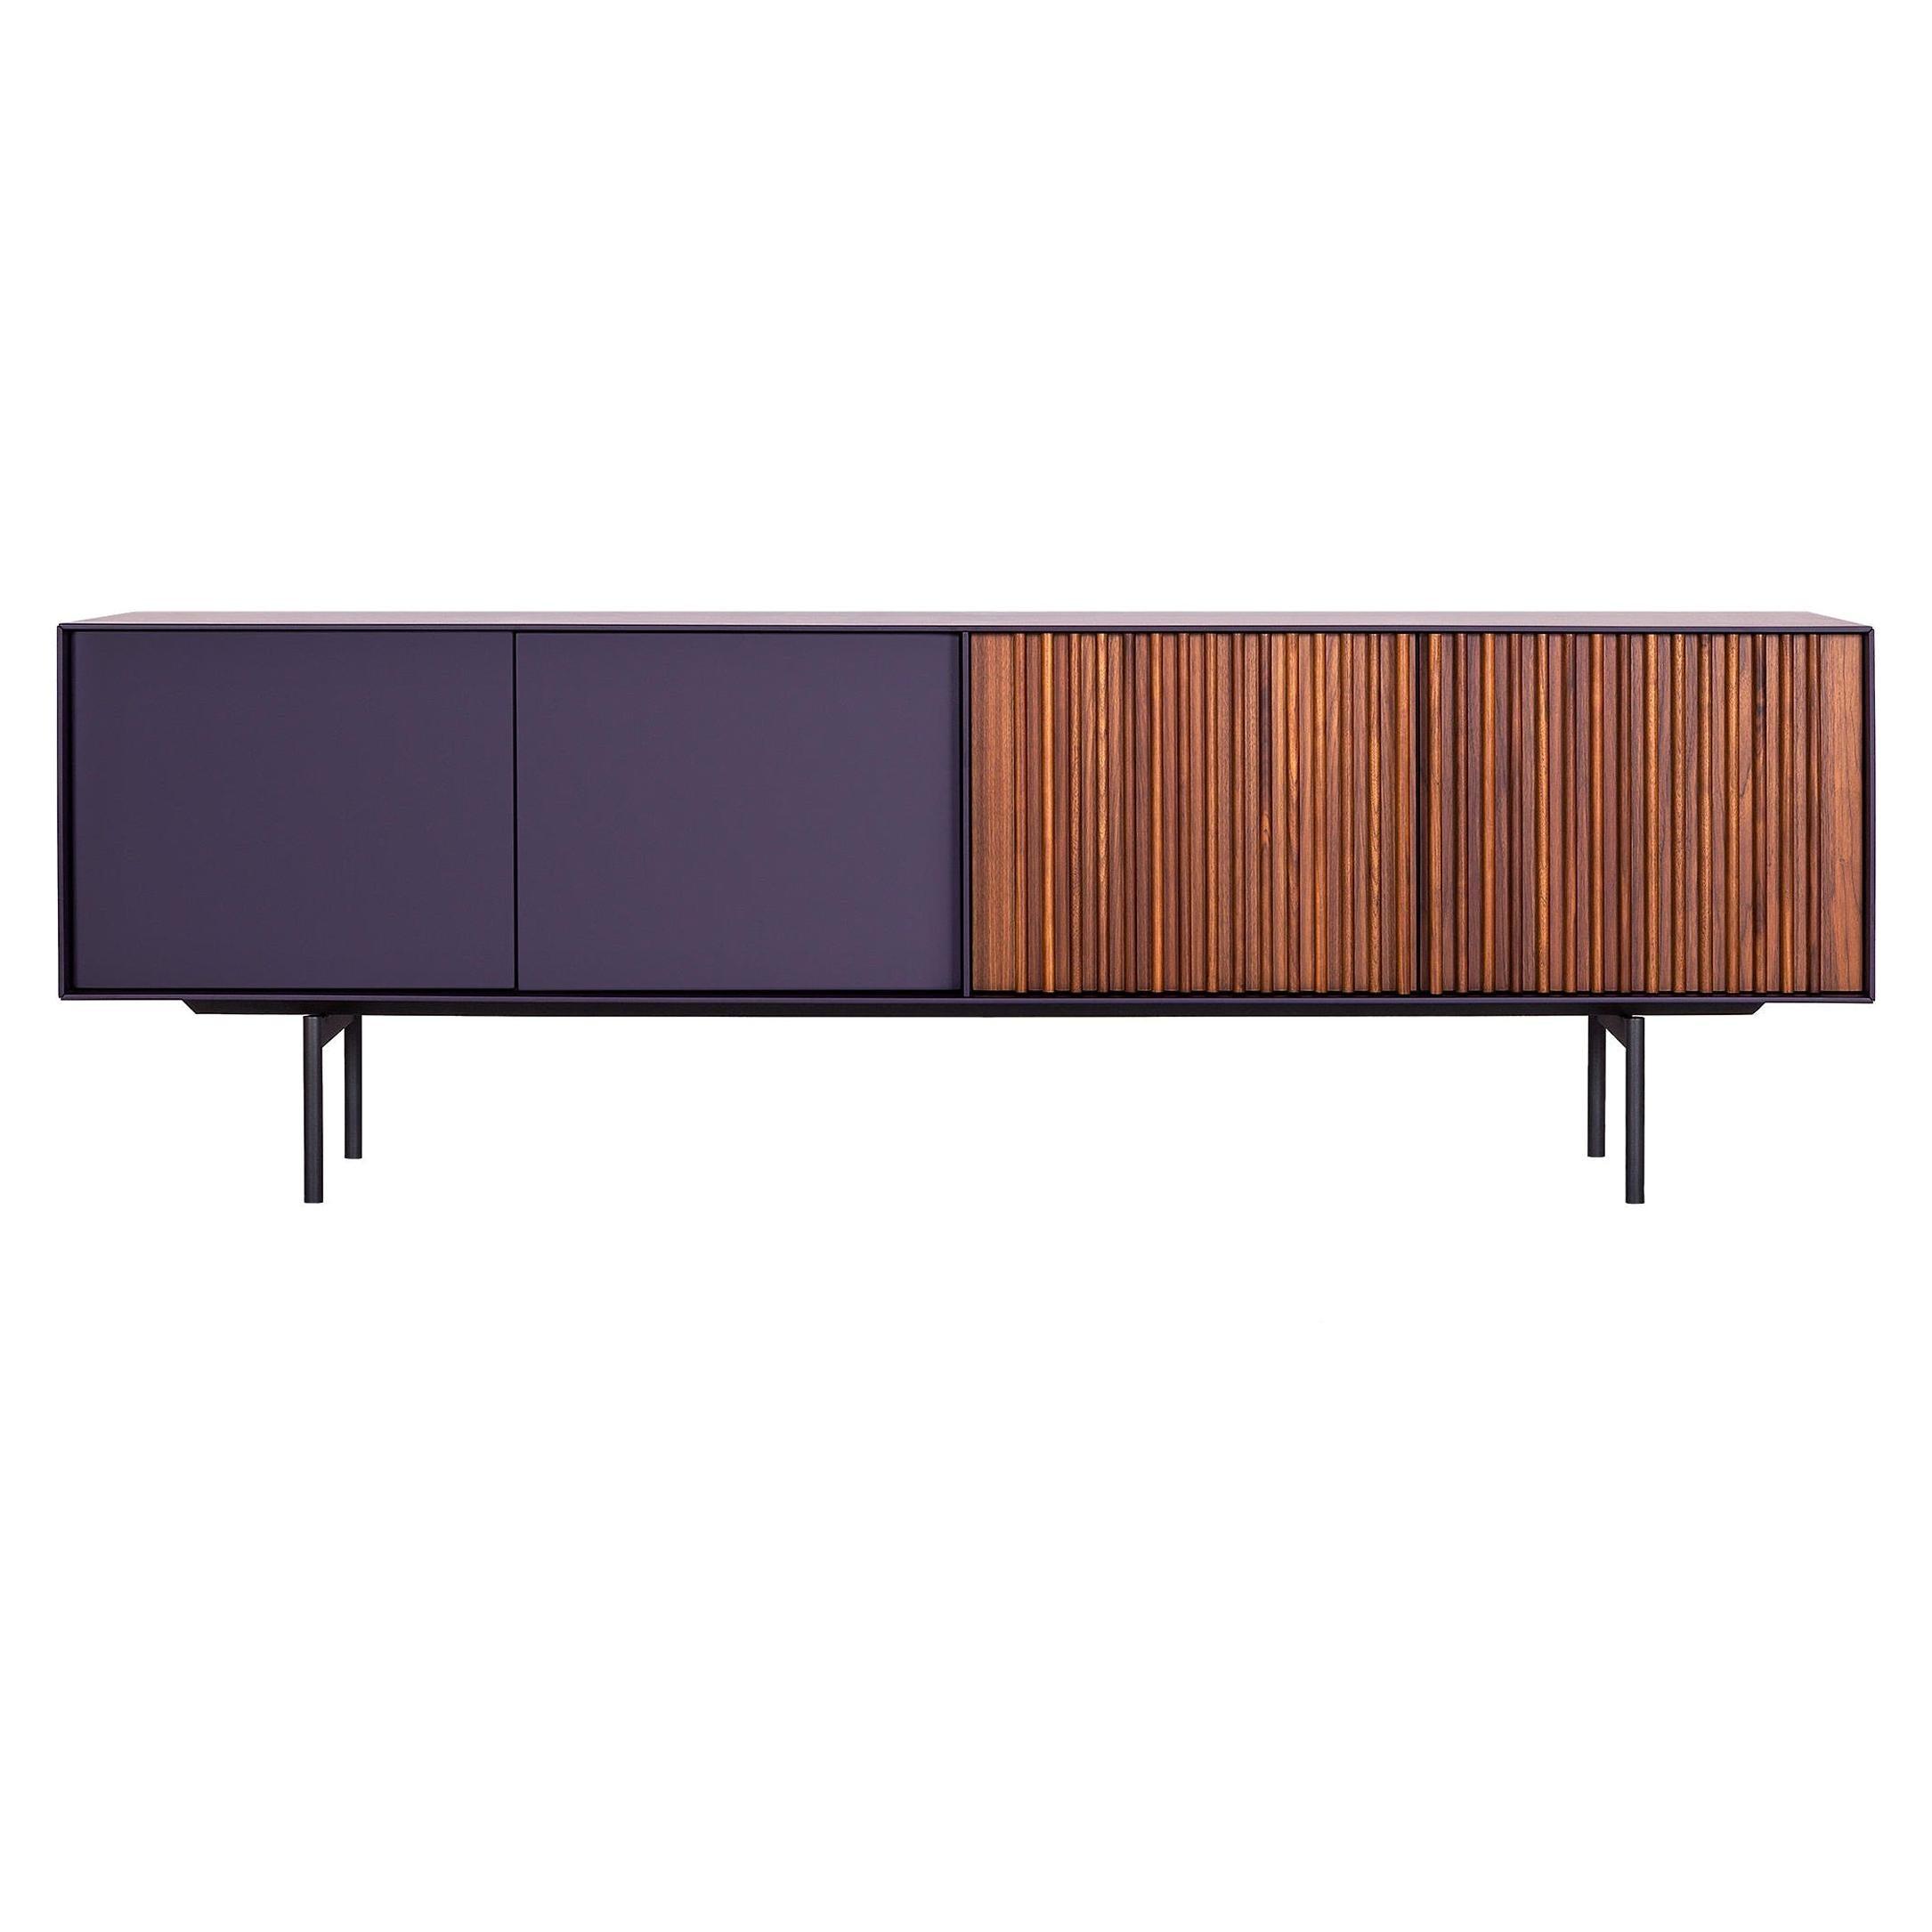 Contemporary Sideboard in American Walnut & Purple Lacquer